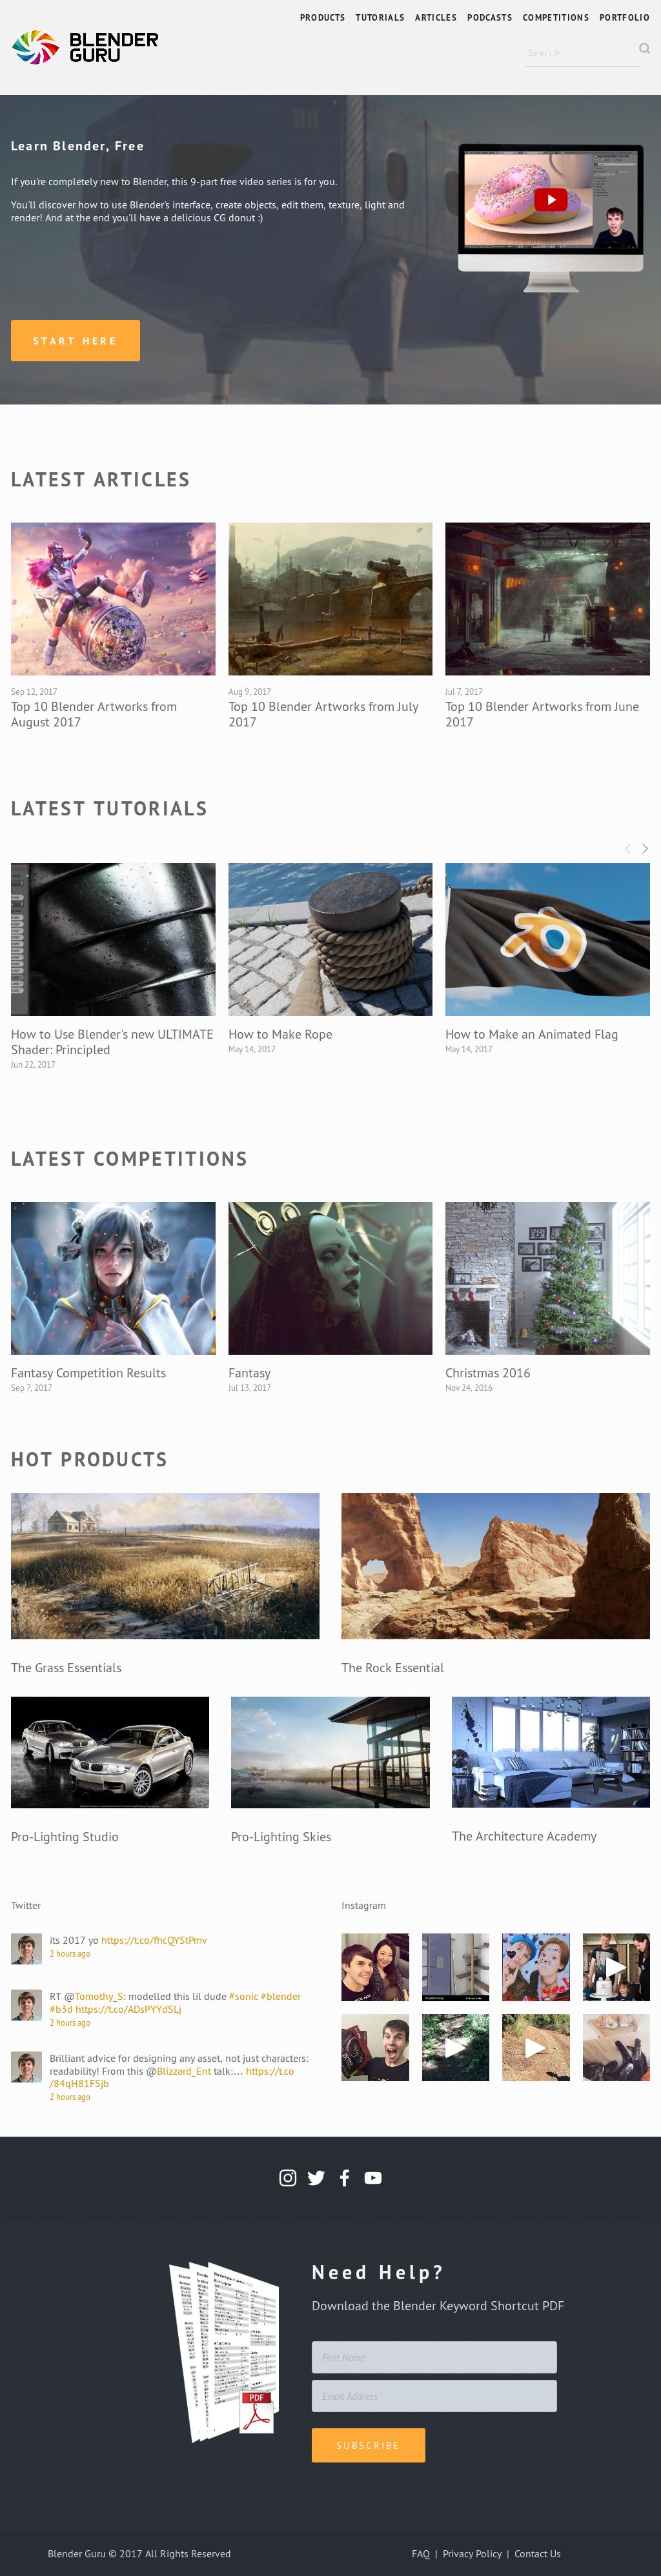 Blender Guru Competitors, Revenue and Employees - Owler Company Profile